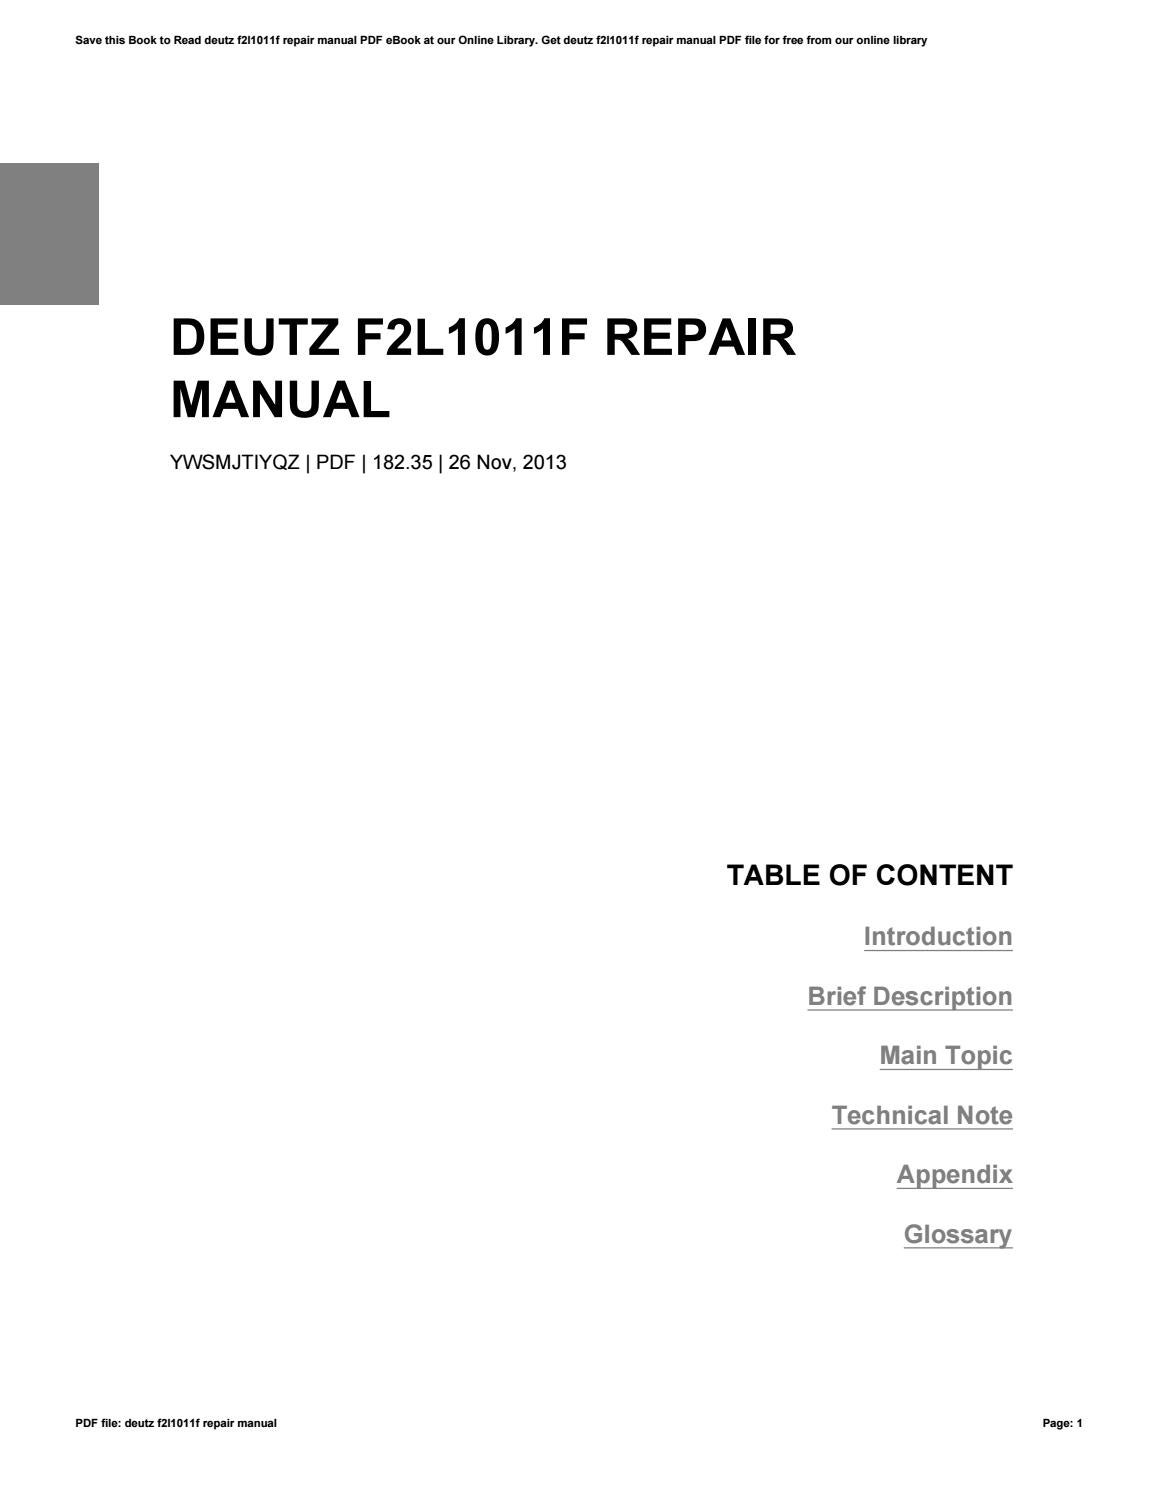 deutz f2l1011f repair manual by rafael issuu rh issuu com deutz f2l1011  parts manual deutz f2l1011f service manual